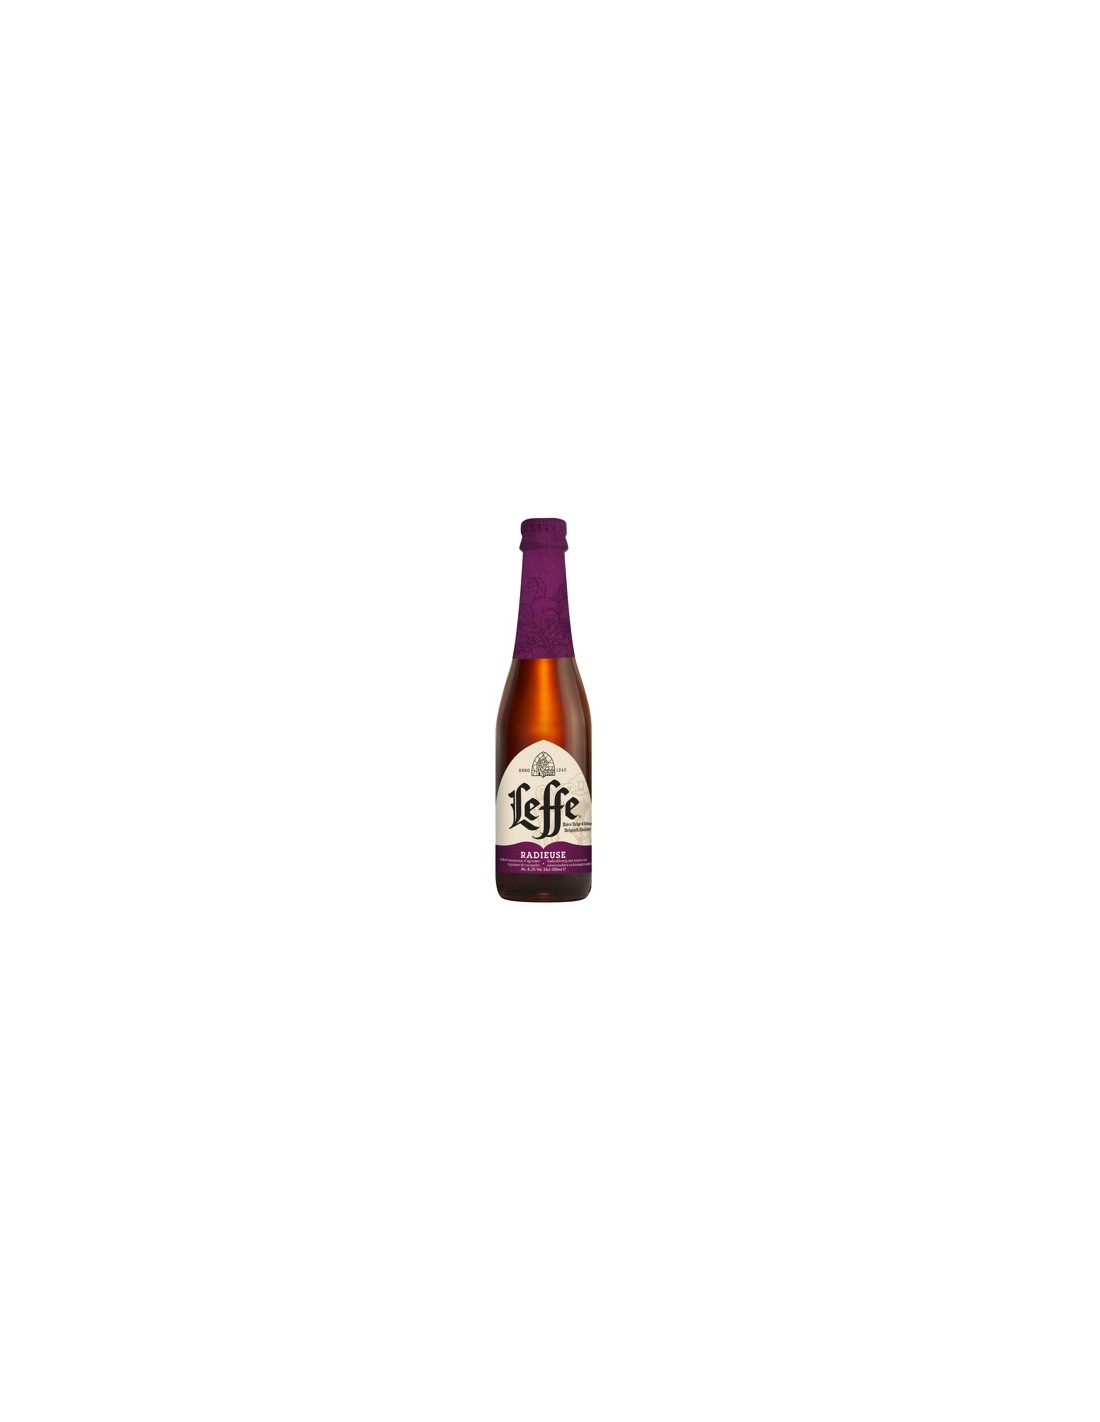 Bere bruna, nefiltrata Leffe Radieuse, 8.2% alc., 0.33L, Belgia